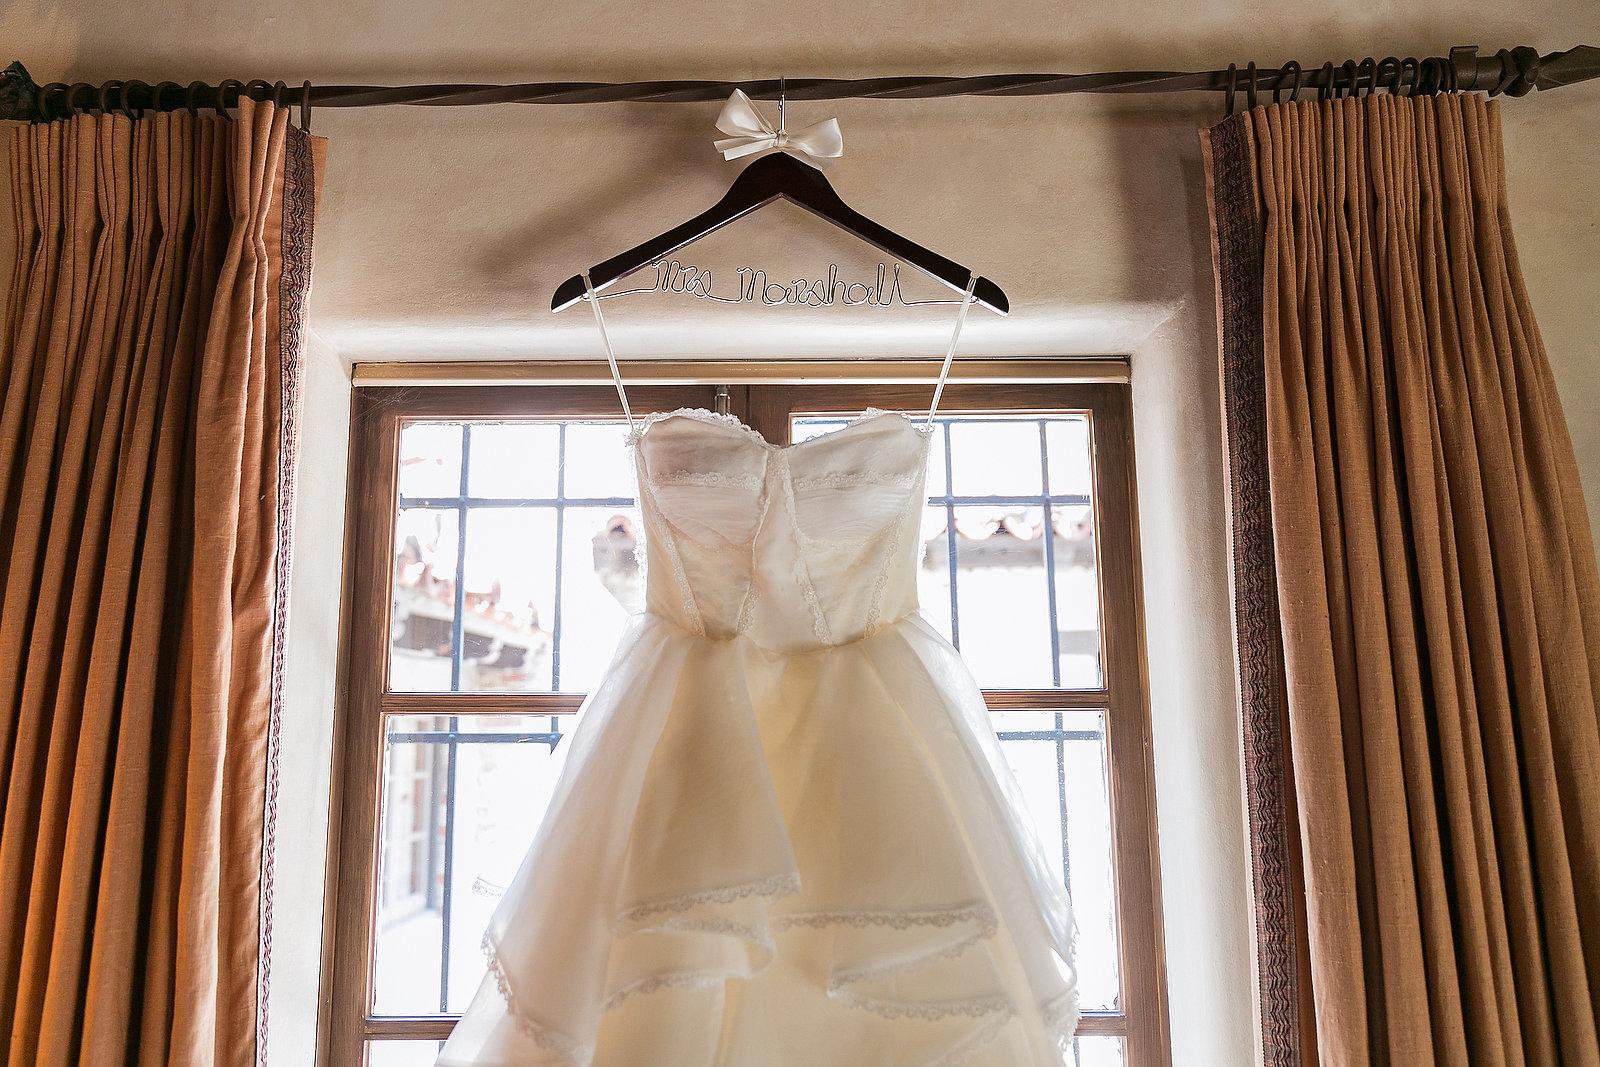 personalized dress hanger